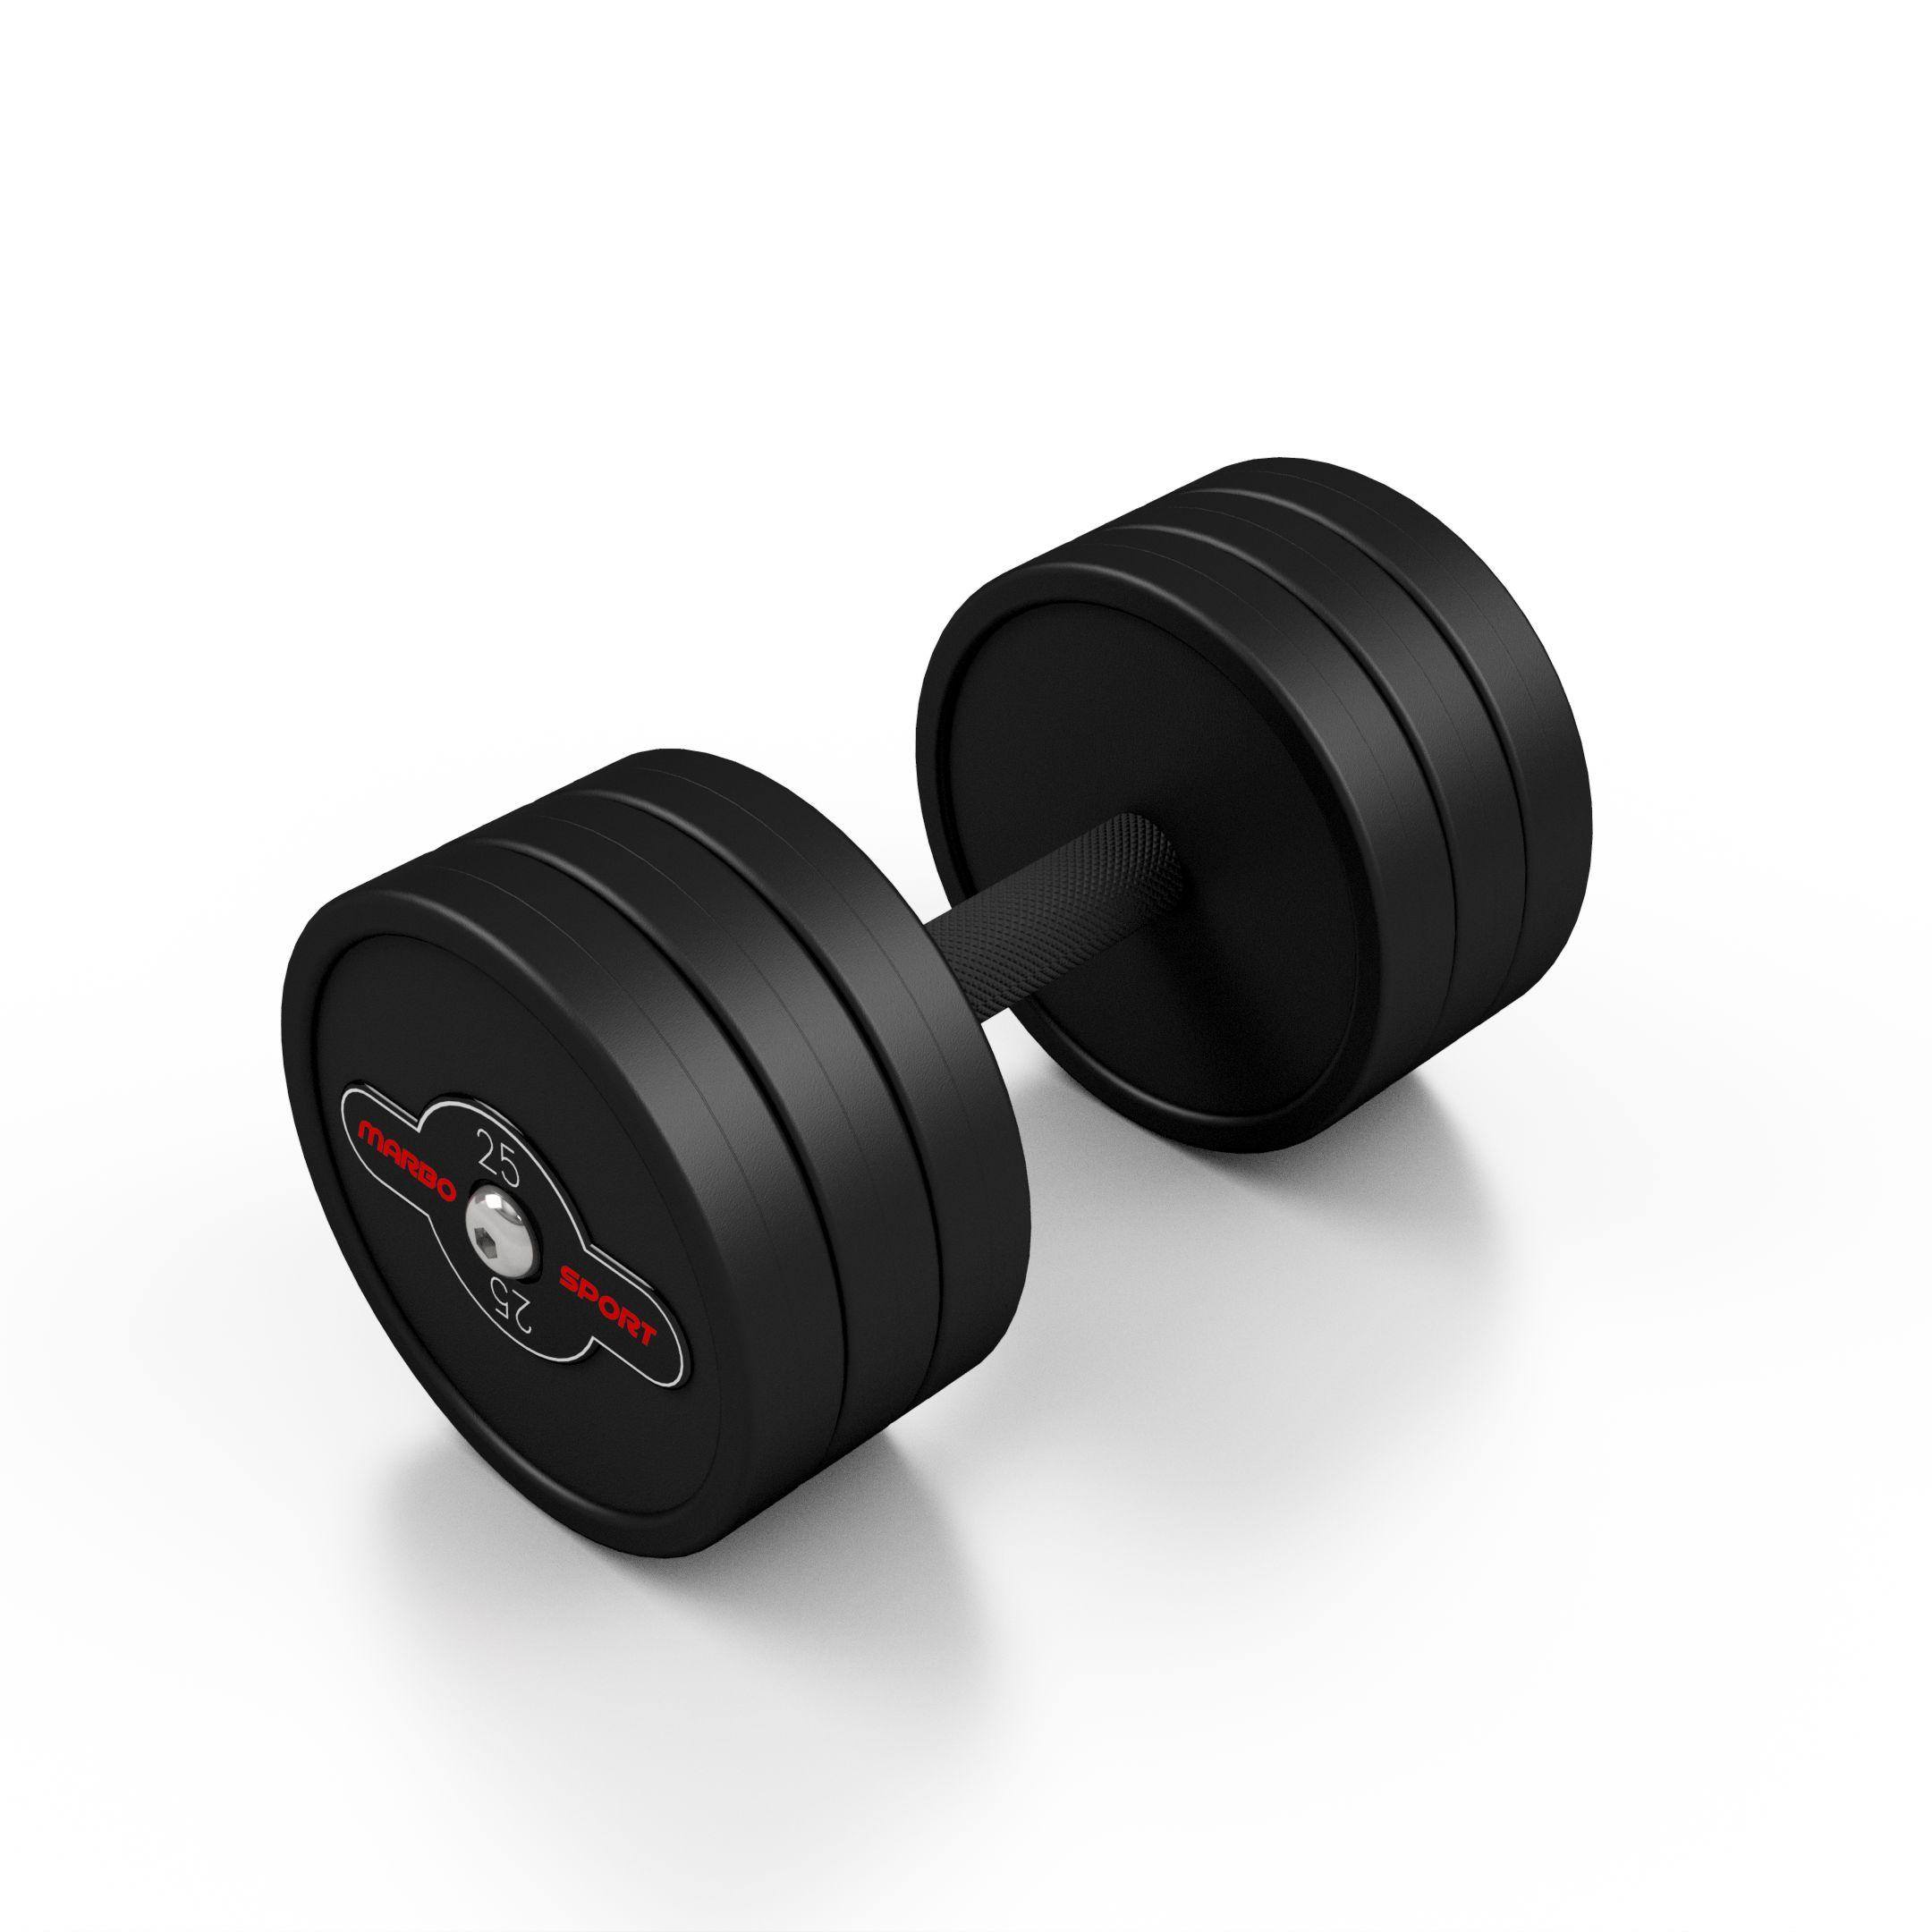 Hantla stalowa gumowana 25 kg czarny mat - Marbo Sport - 25 kg